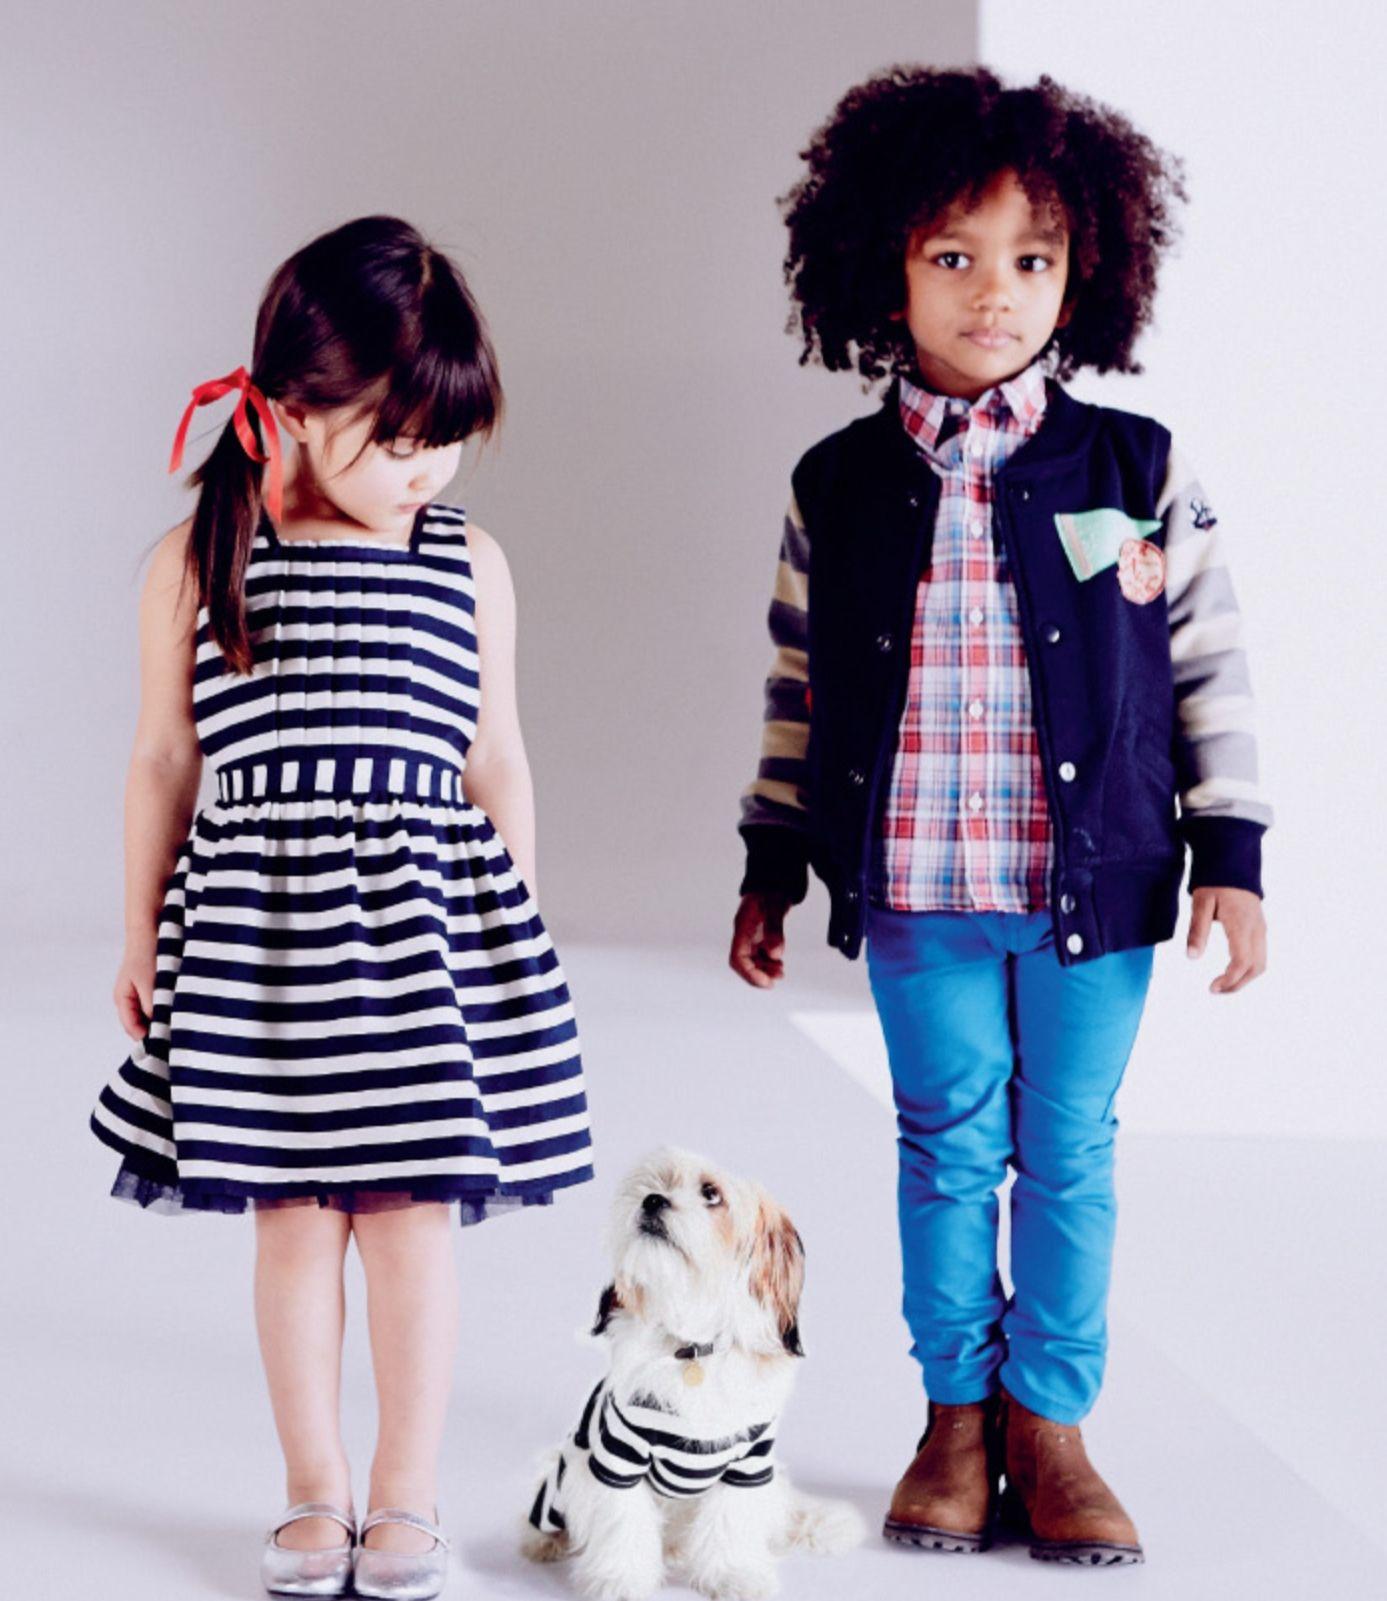 Harrods magazine fashion photography kids pinterest